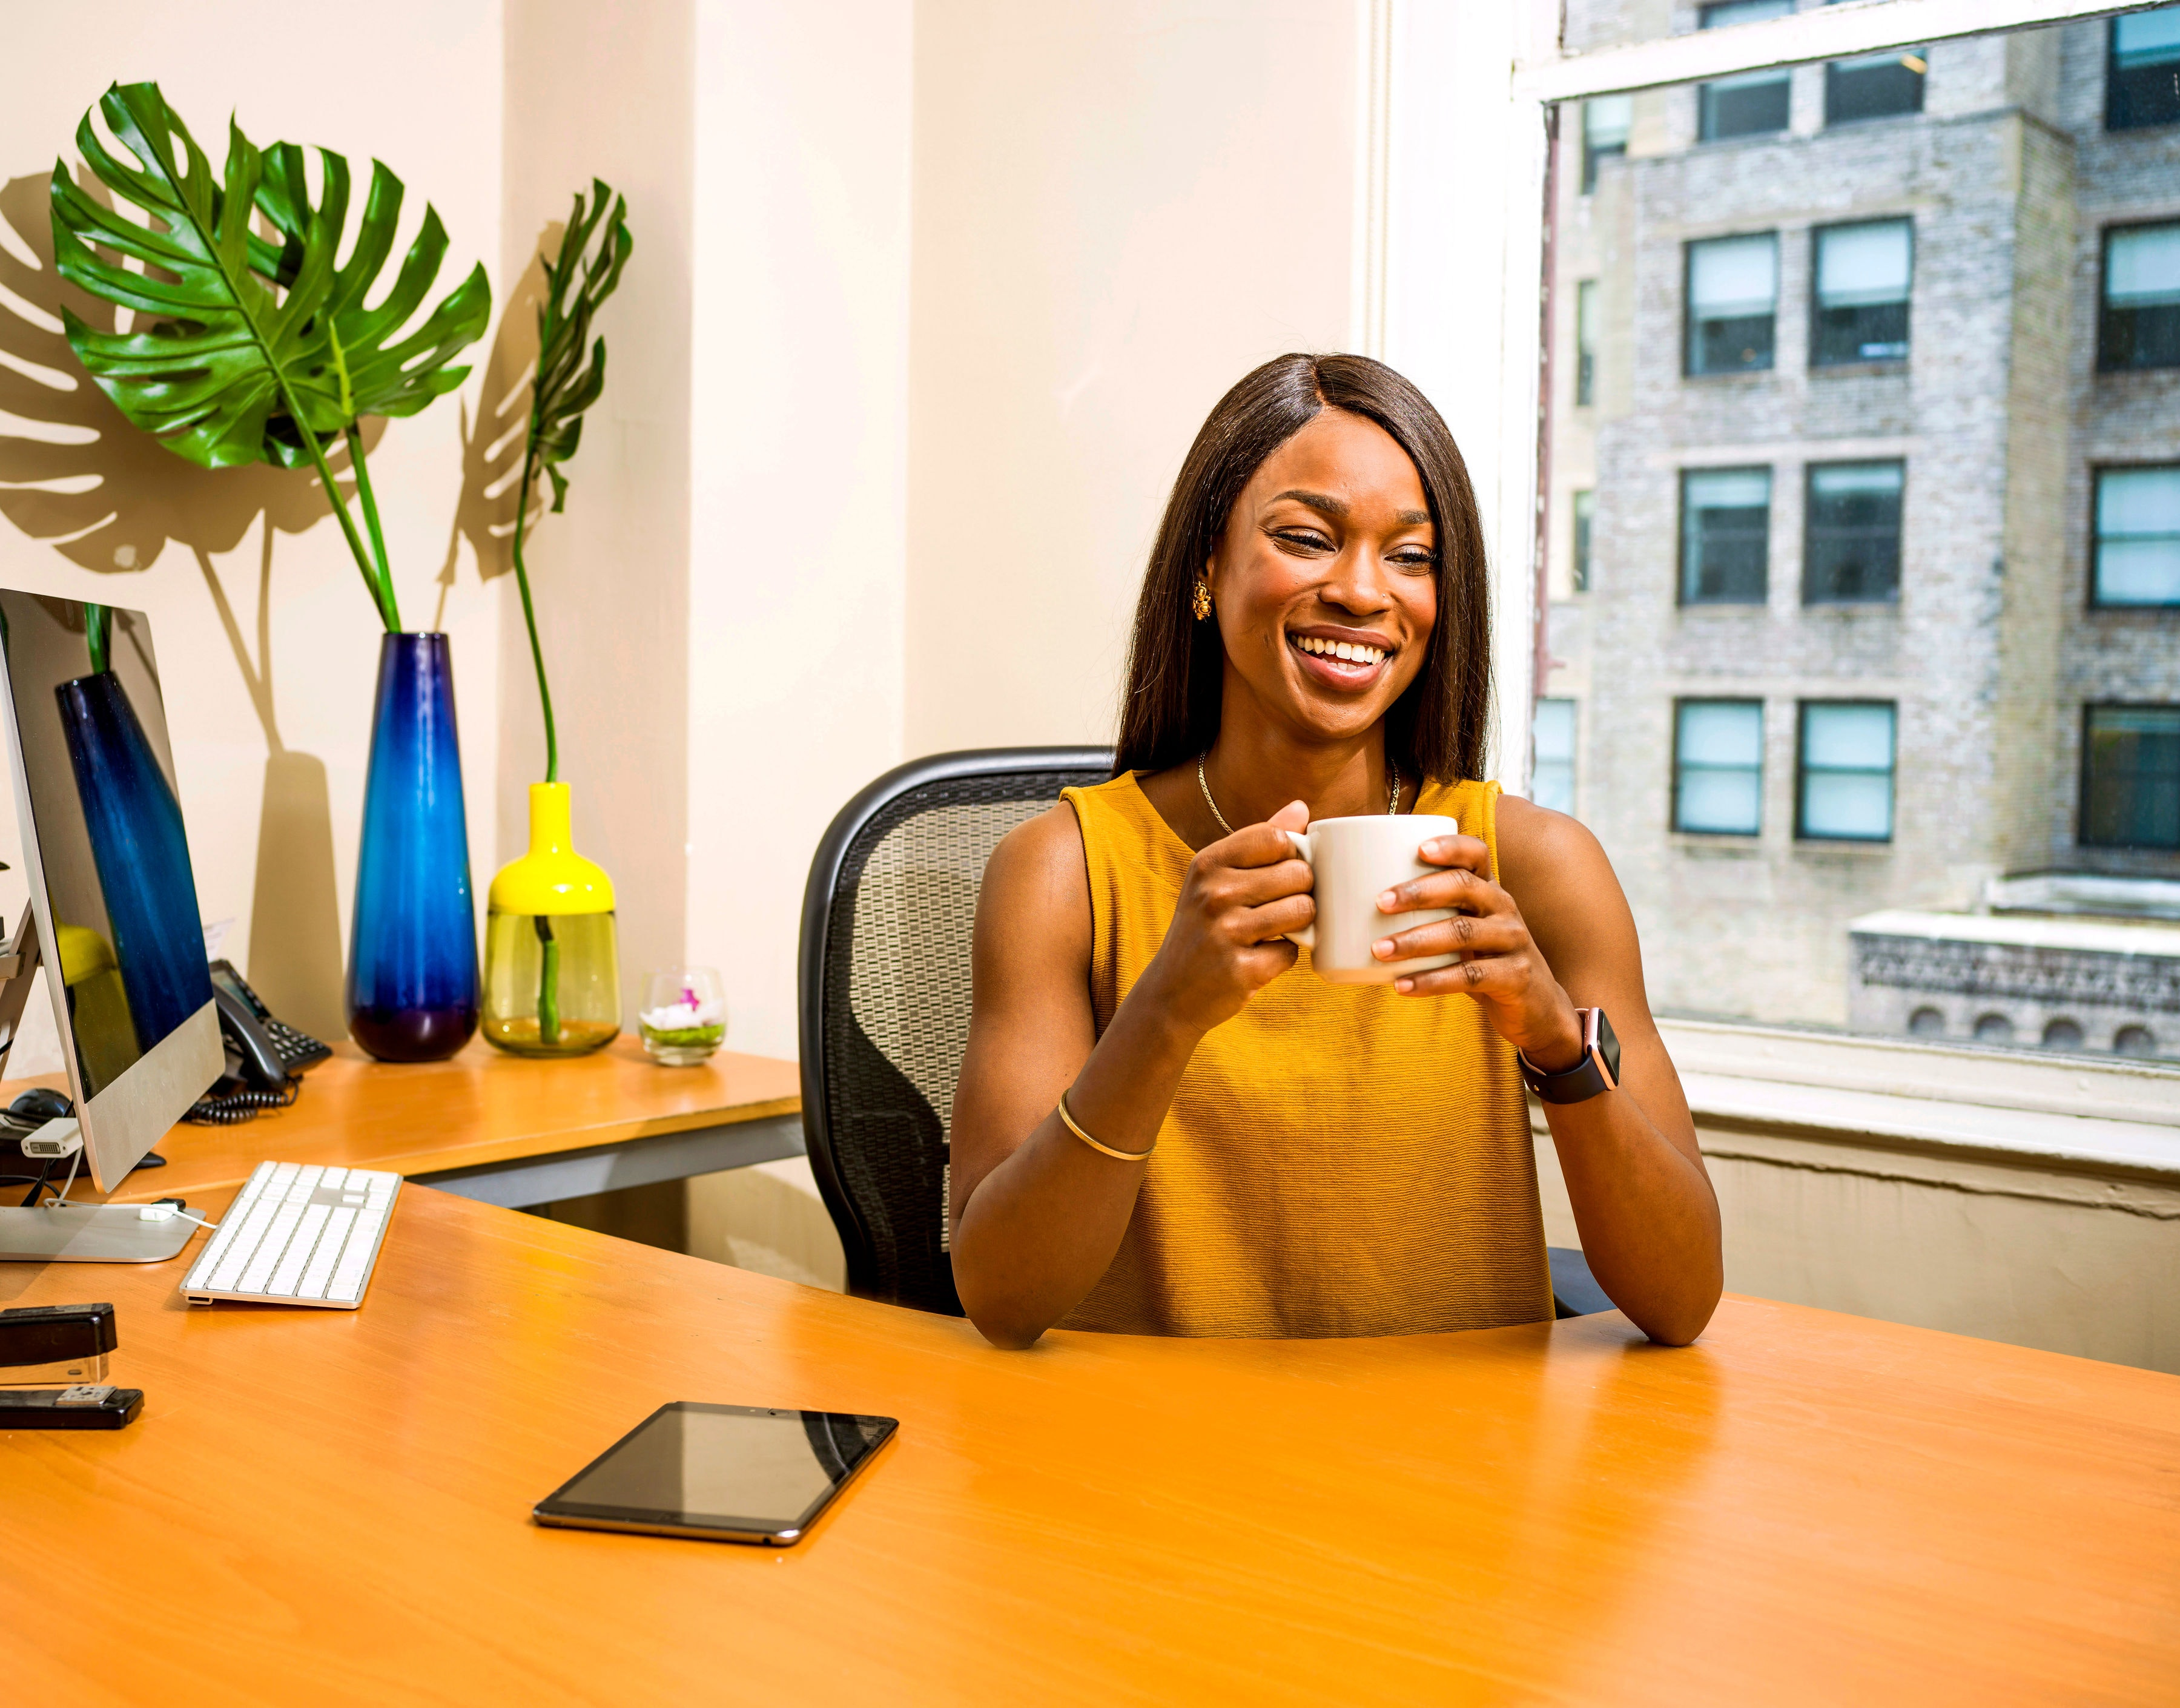 woman-holding-white-ceramic-mug-at-desk-2422287